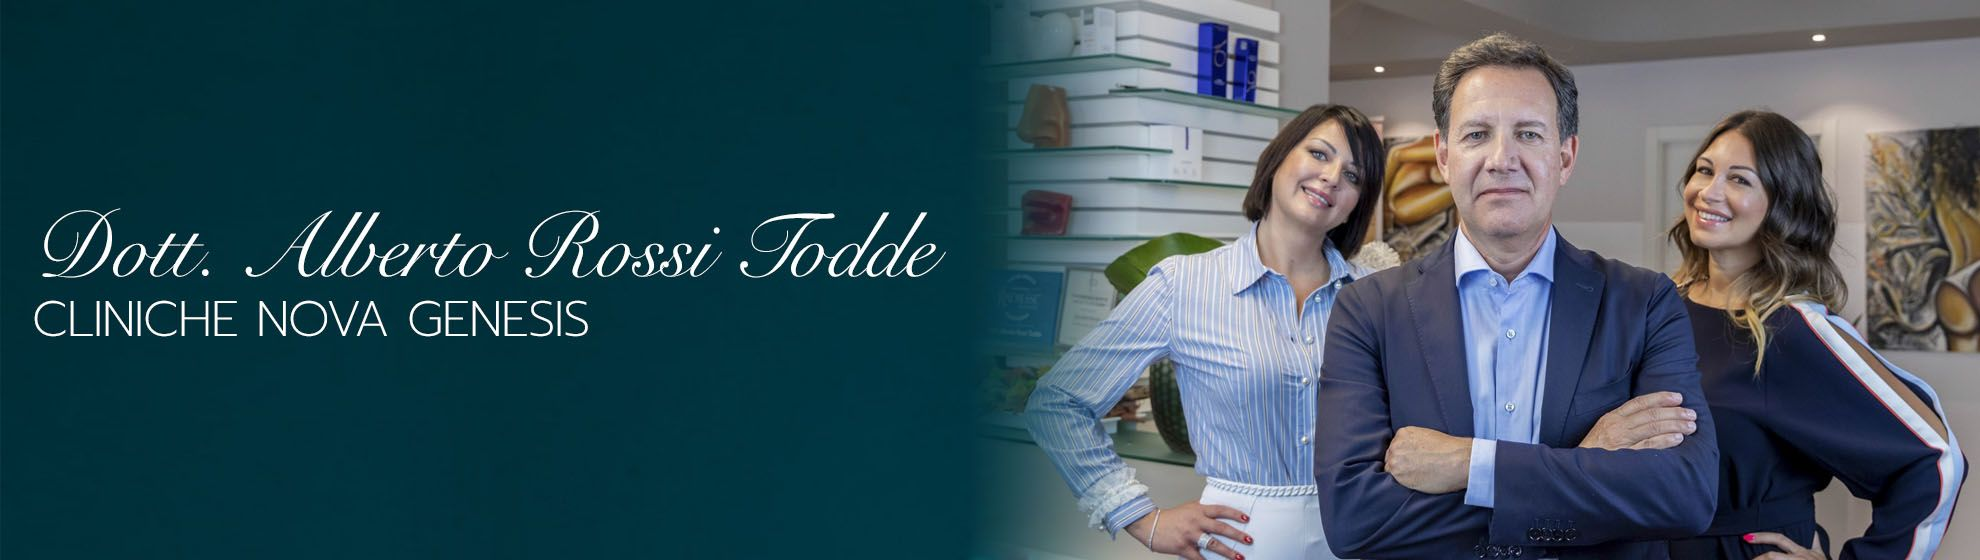 Dott. Alberto Rossi Todde Cliniche Nova Genesis